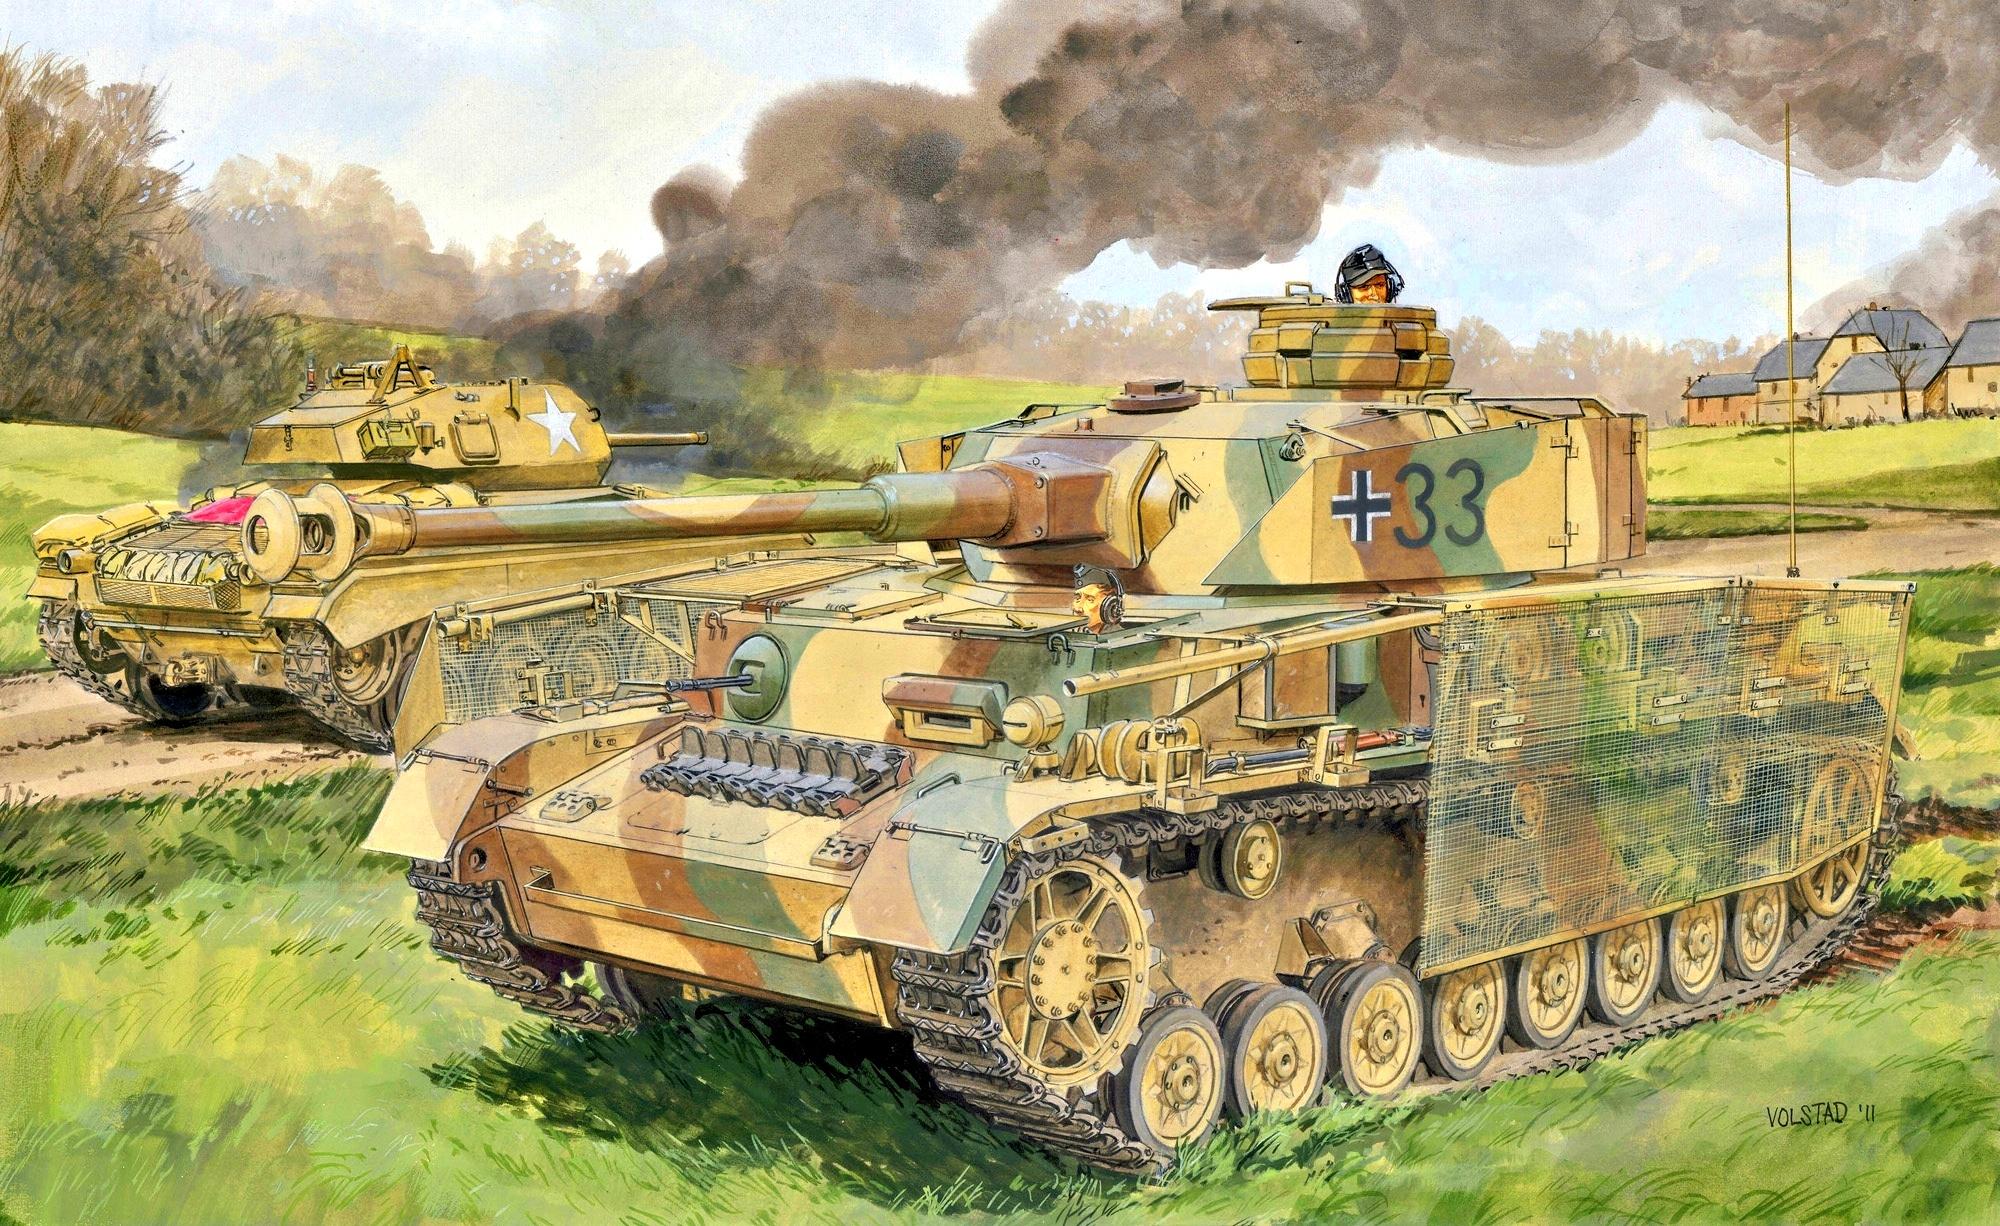 WW2 Landmark Scout Vehicles: Panzerkampfwagen IV ausf J